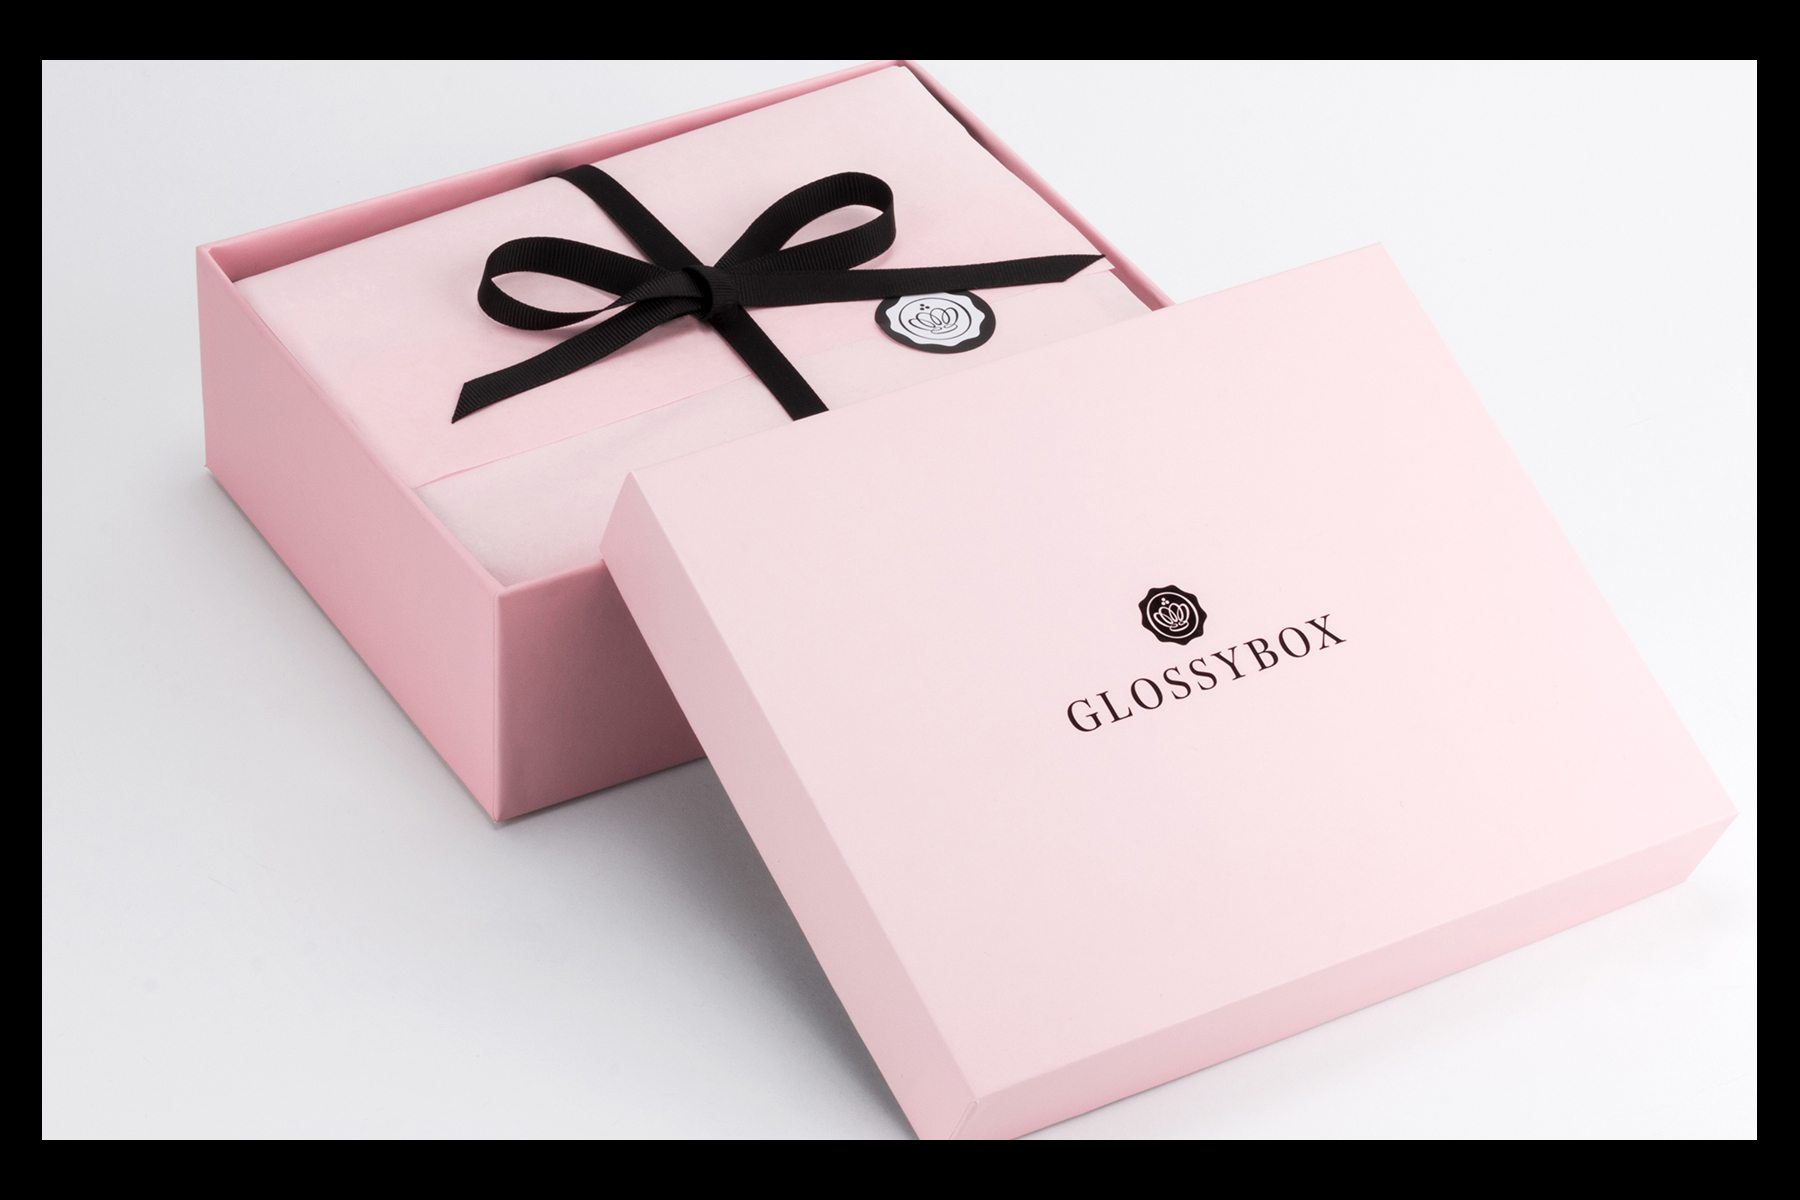 glossybox